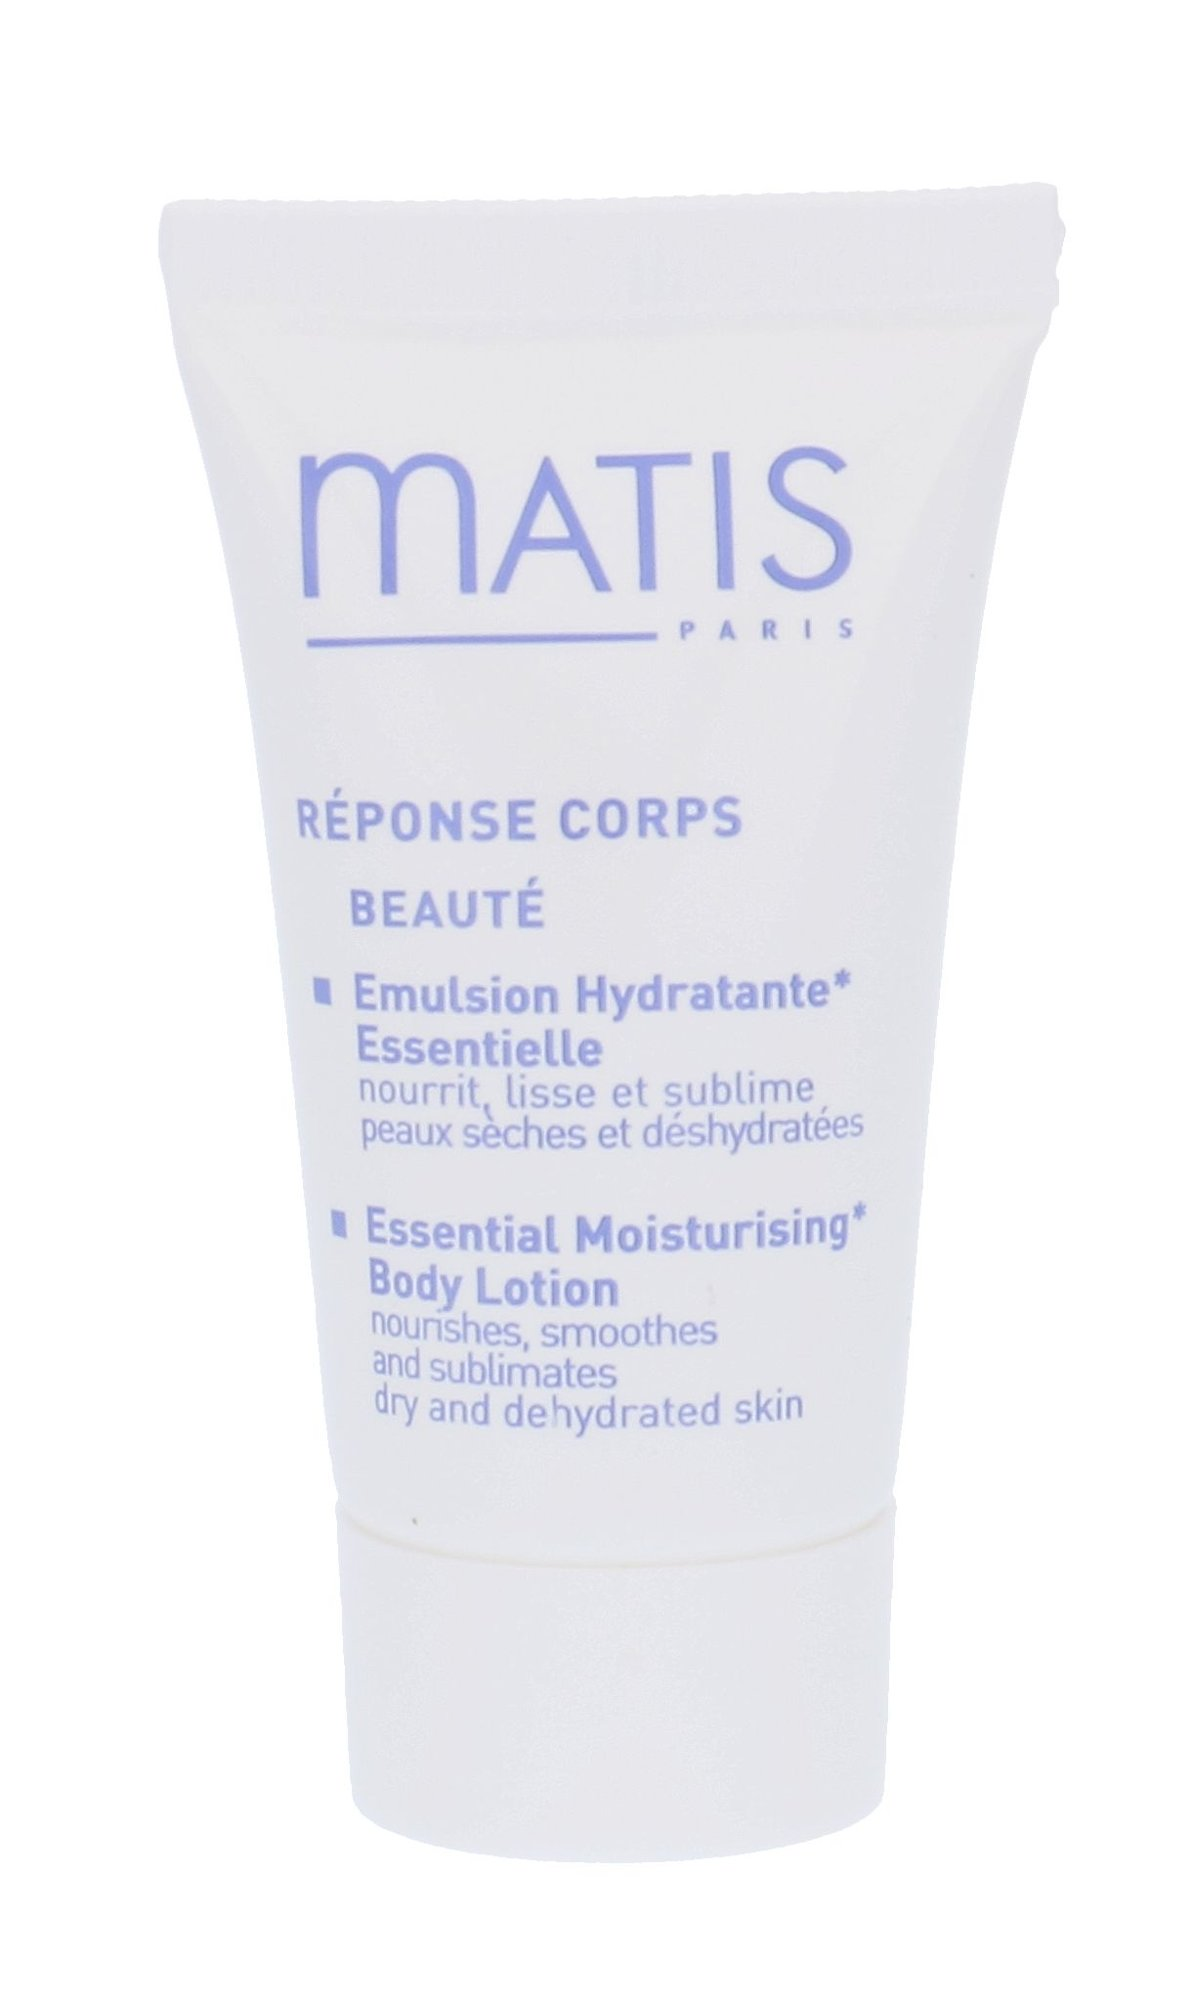 Matis Réponse Corps Beauté Cosmetic 15ml  Moisturising Body Lotion